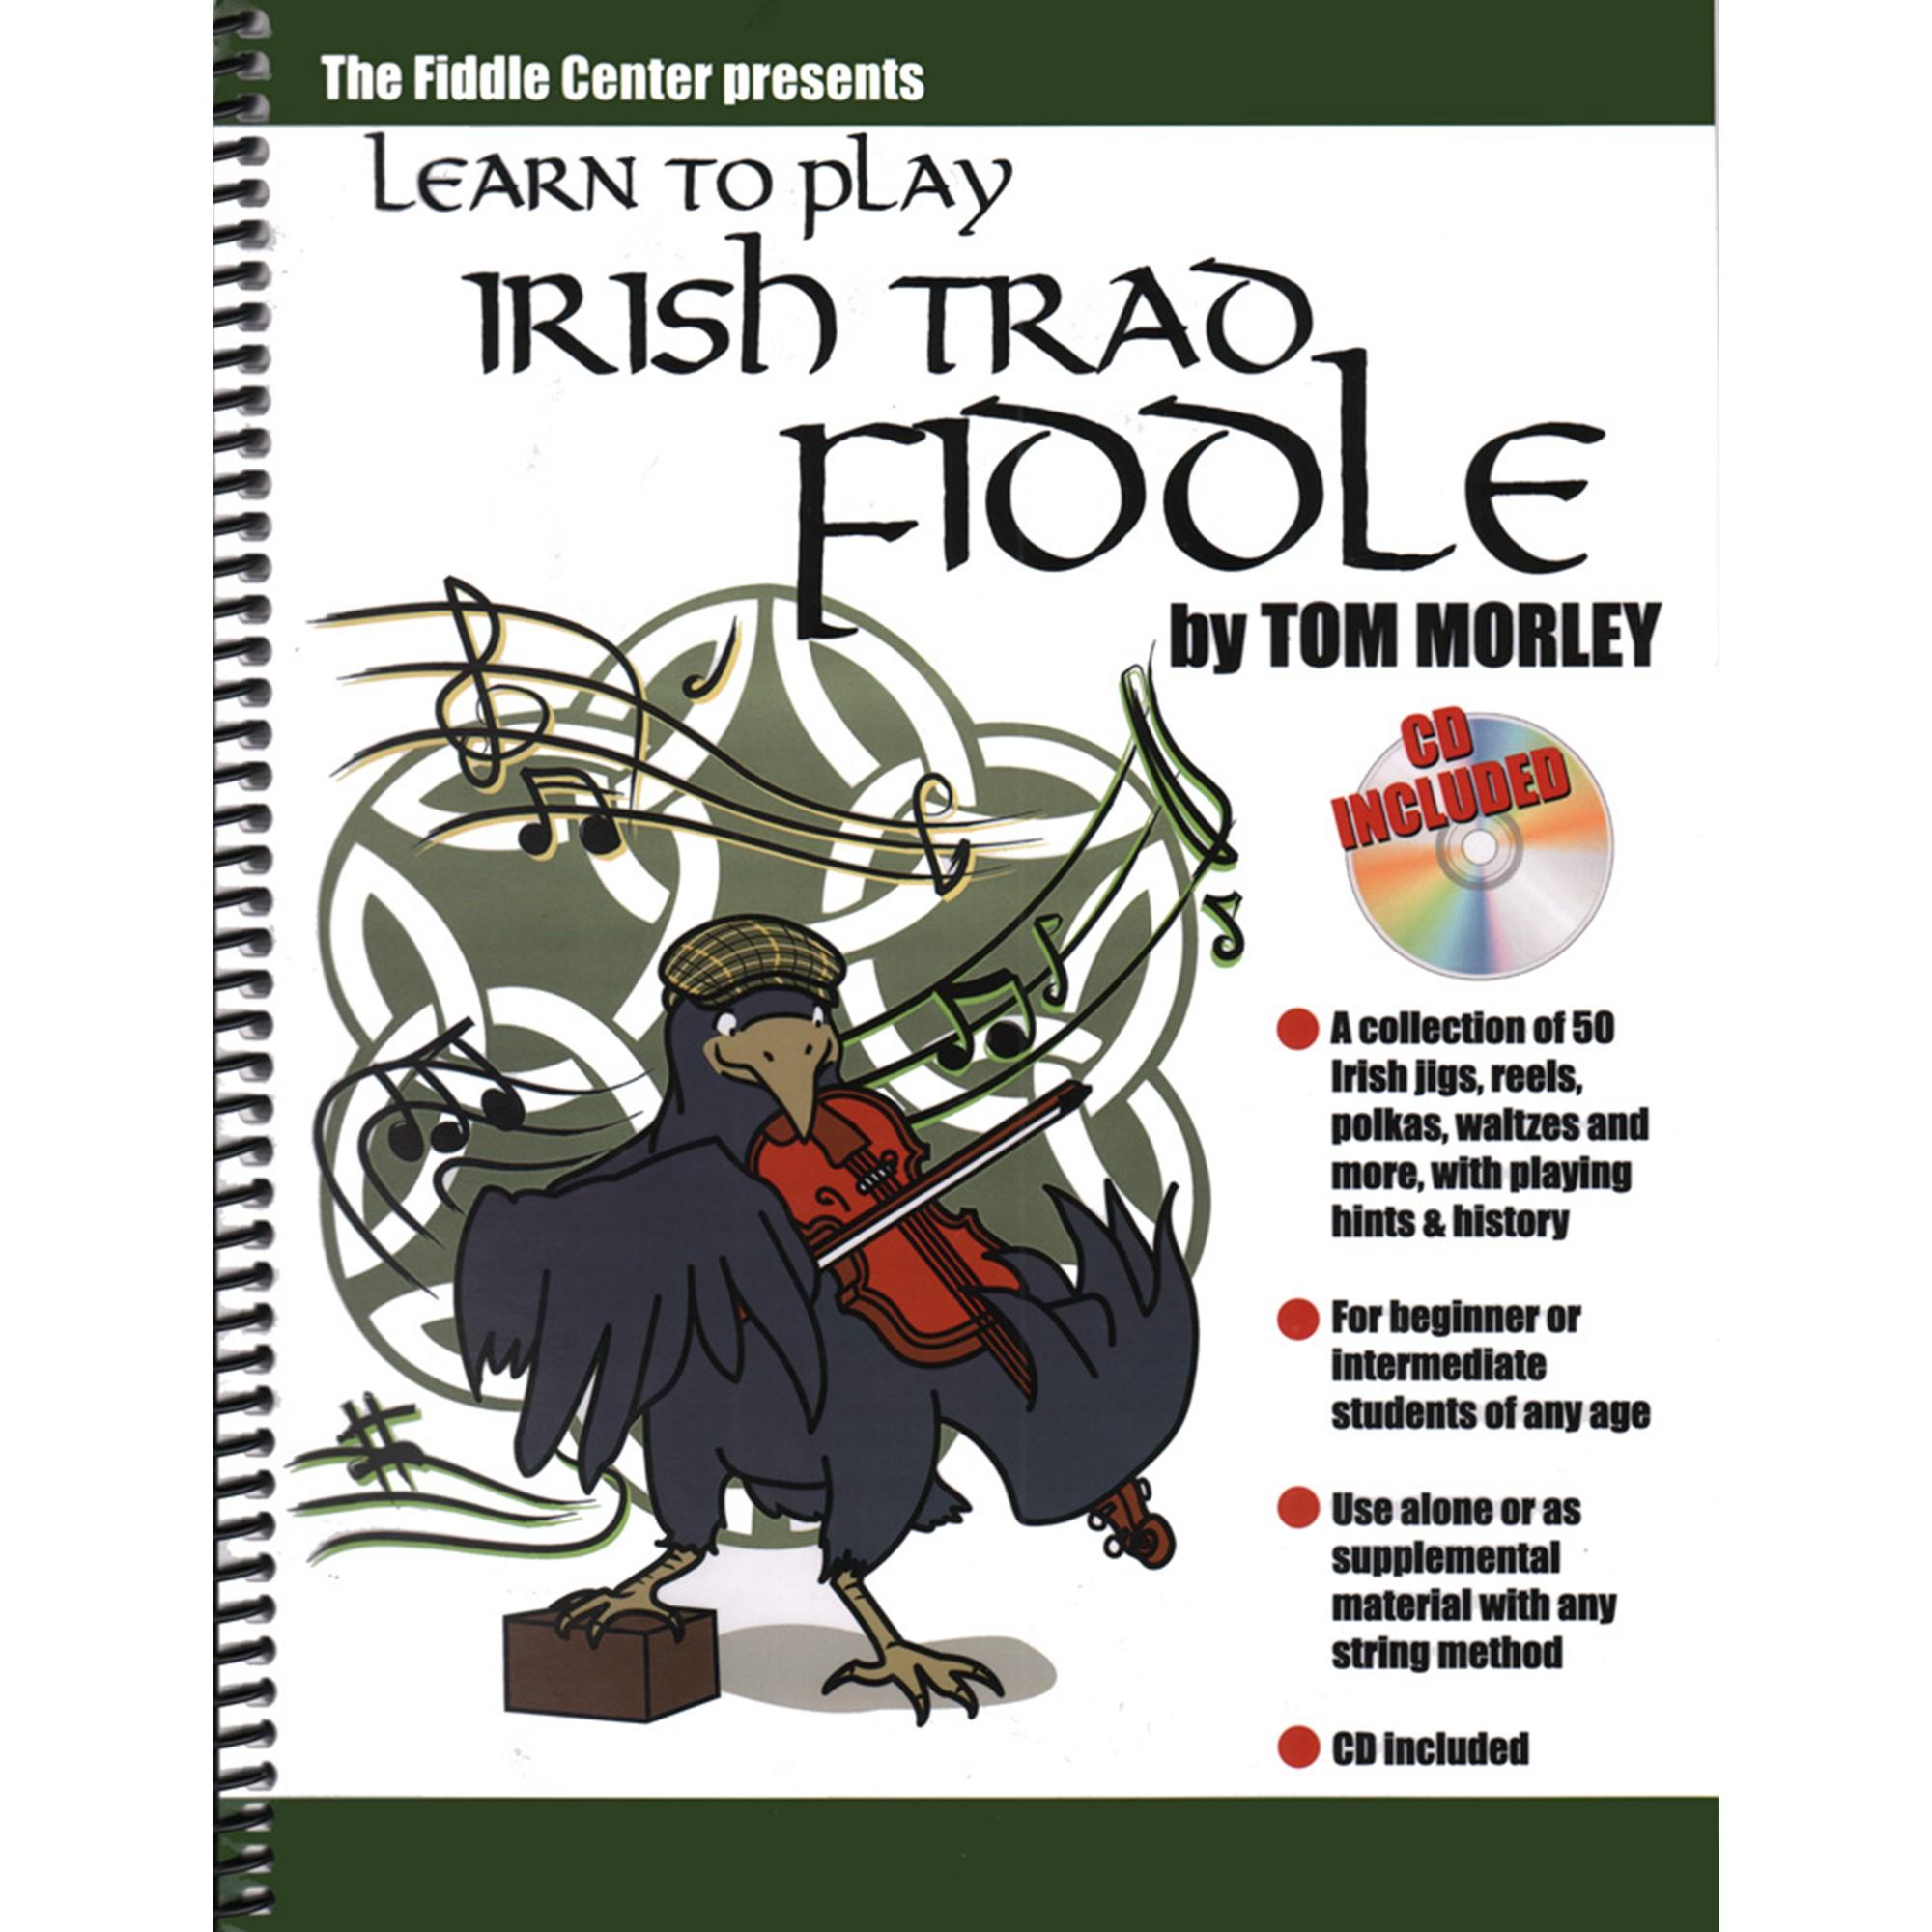 morley irish fiddle.jpg